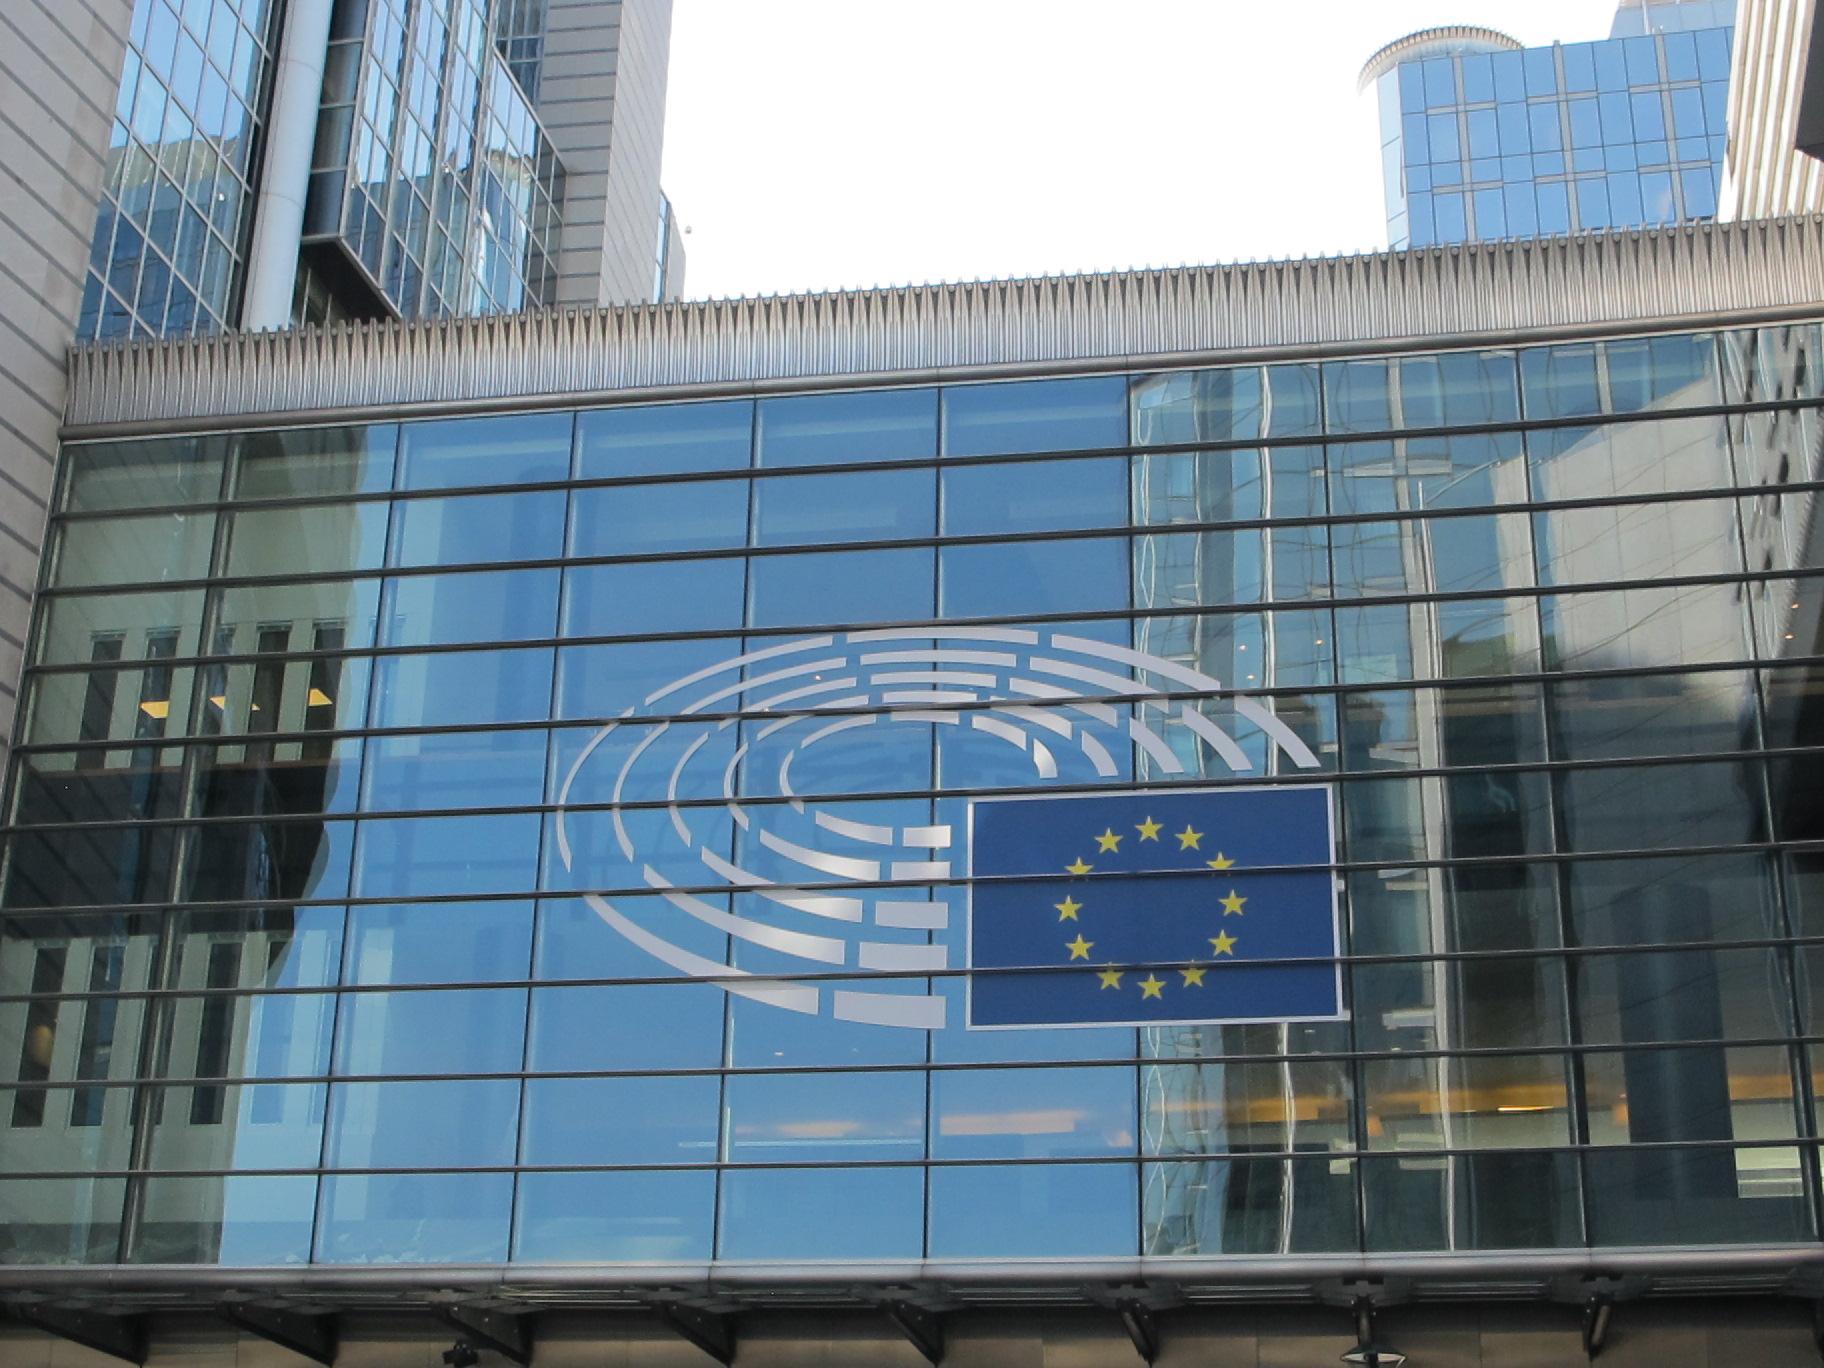 EU-Parlamentsgebäude in Brüssel